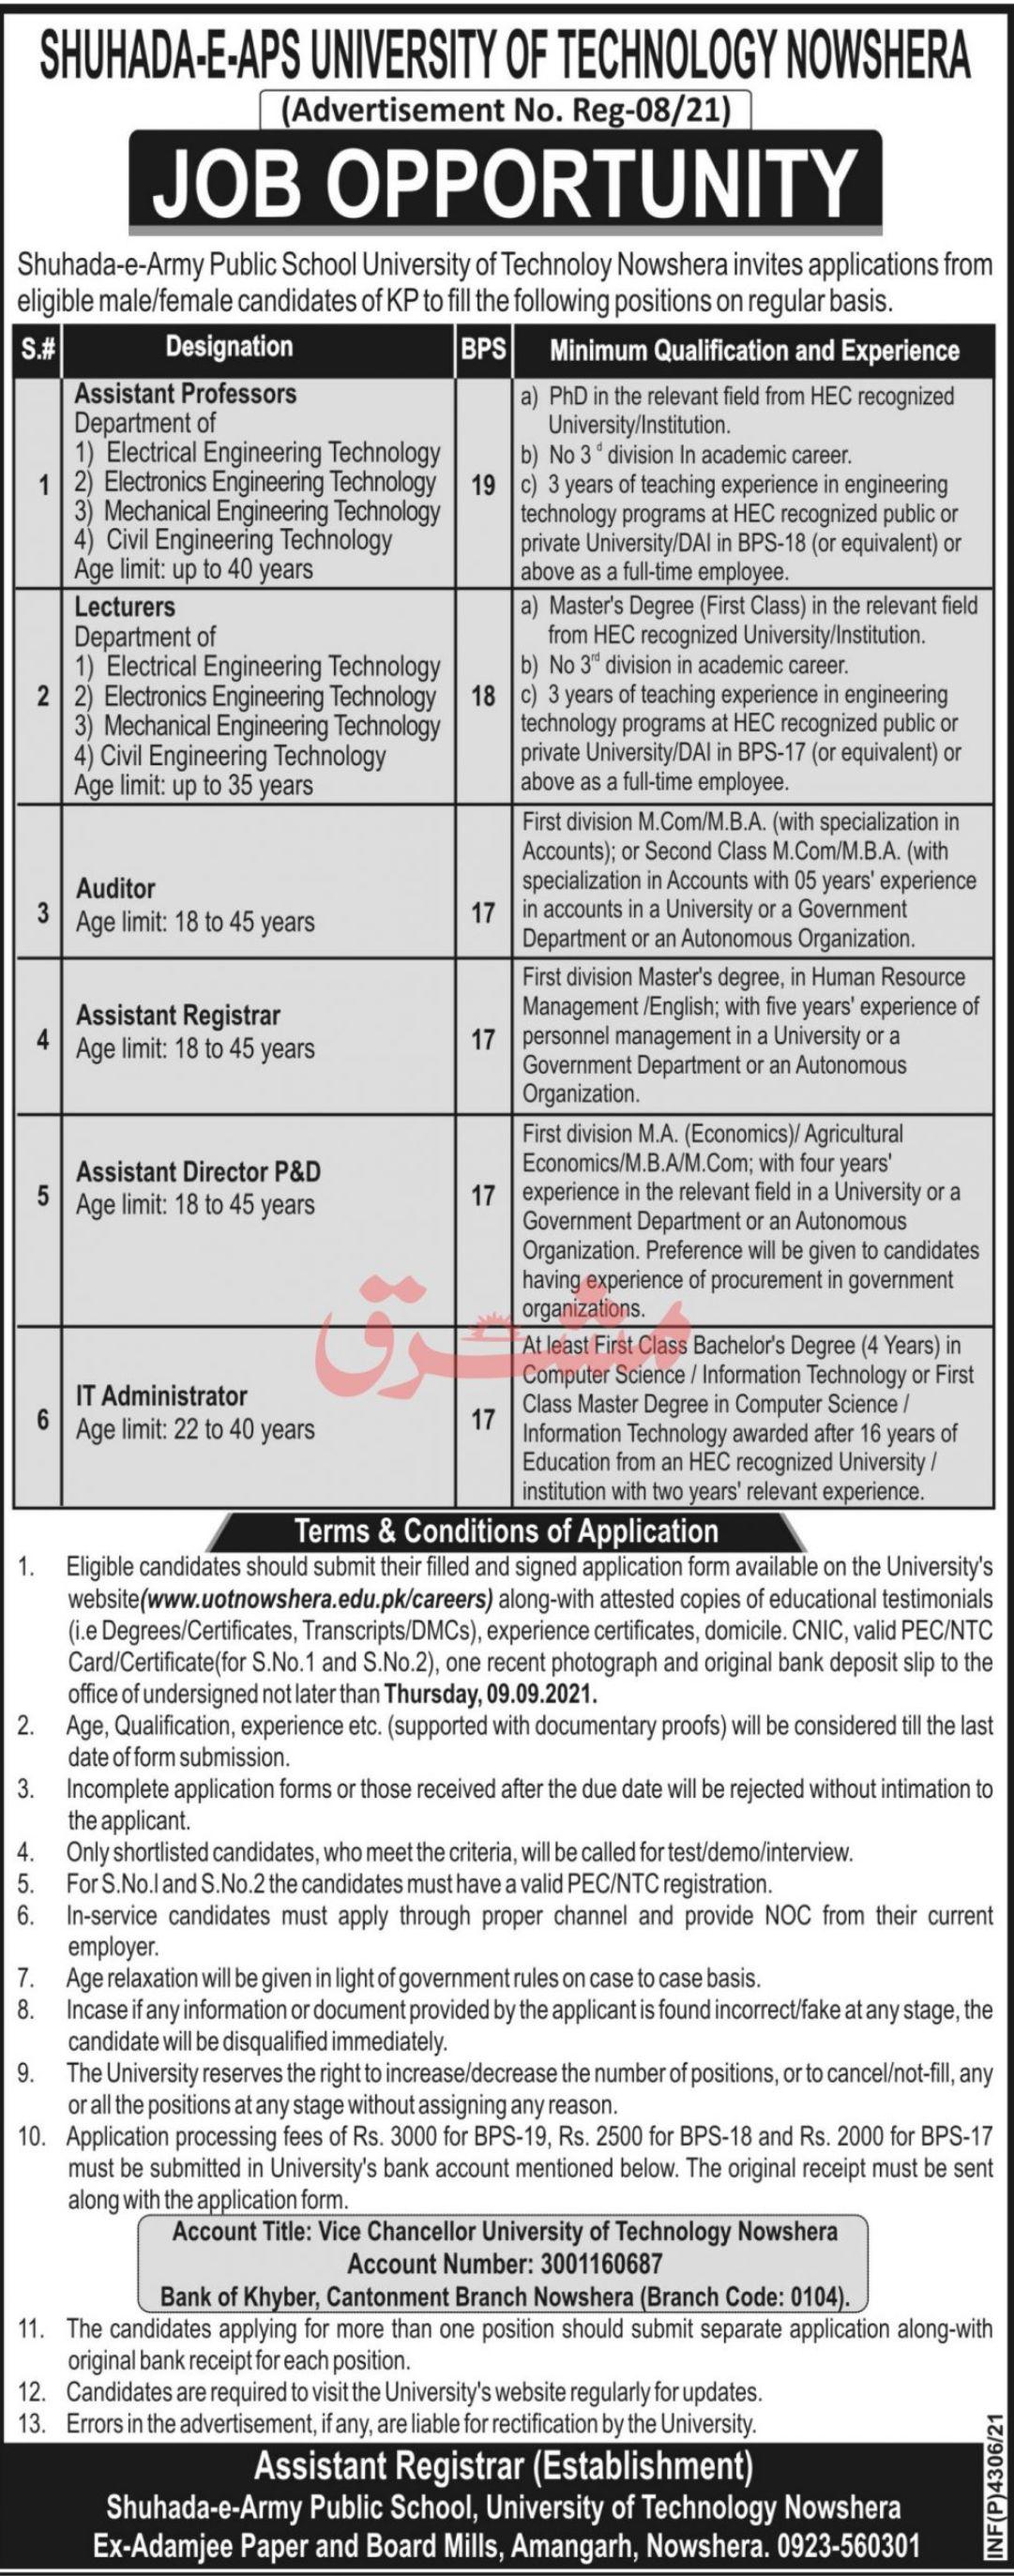 Shuhada-e-APS Uiversity of Technology Nowshera Vacancies 2021 2